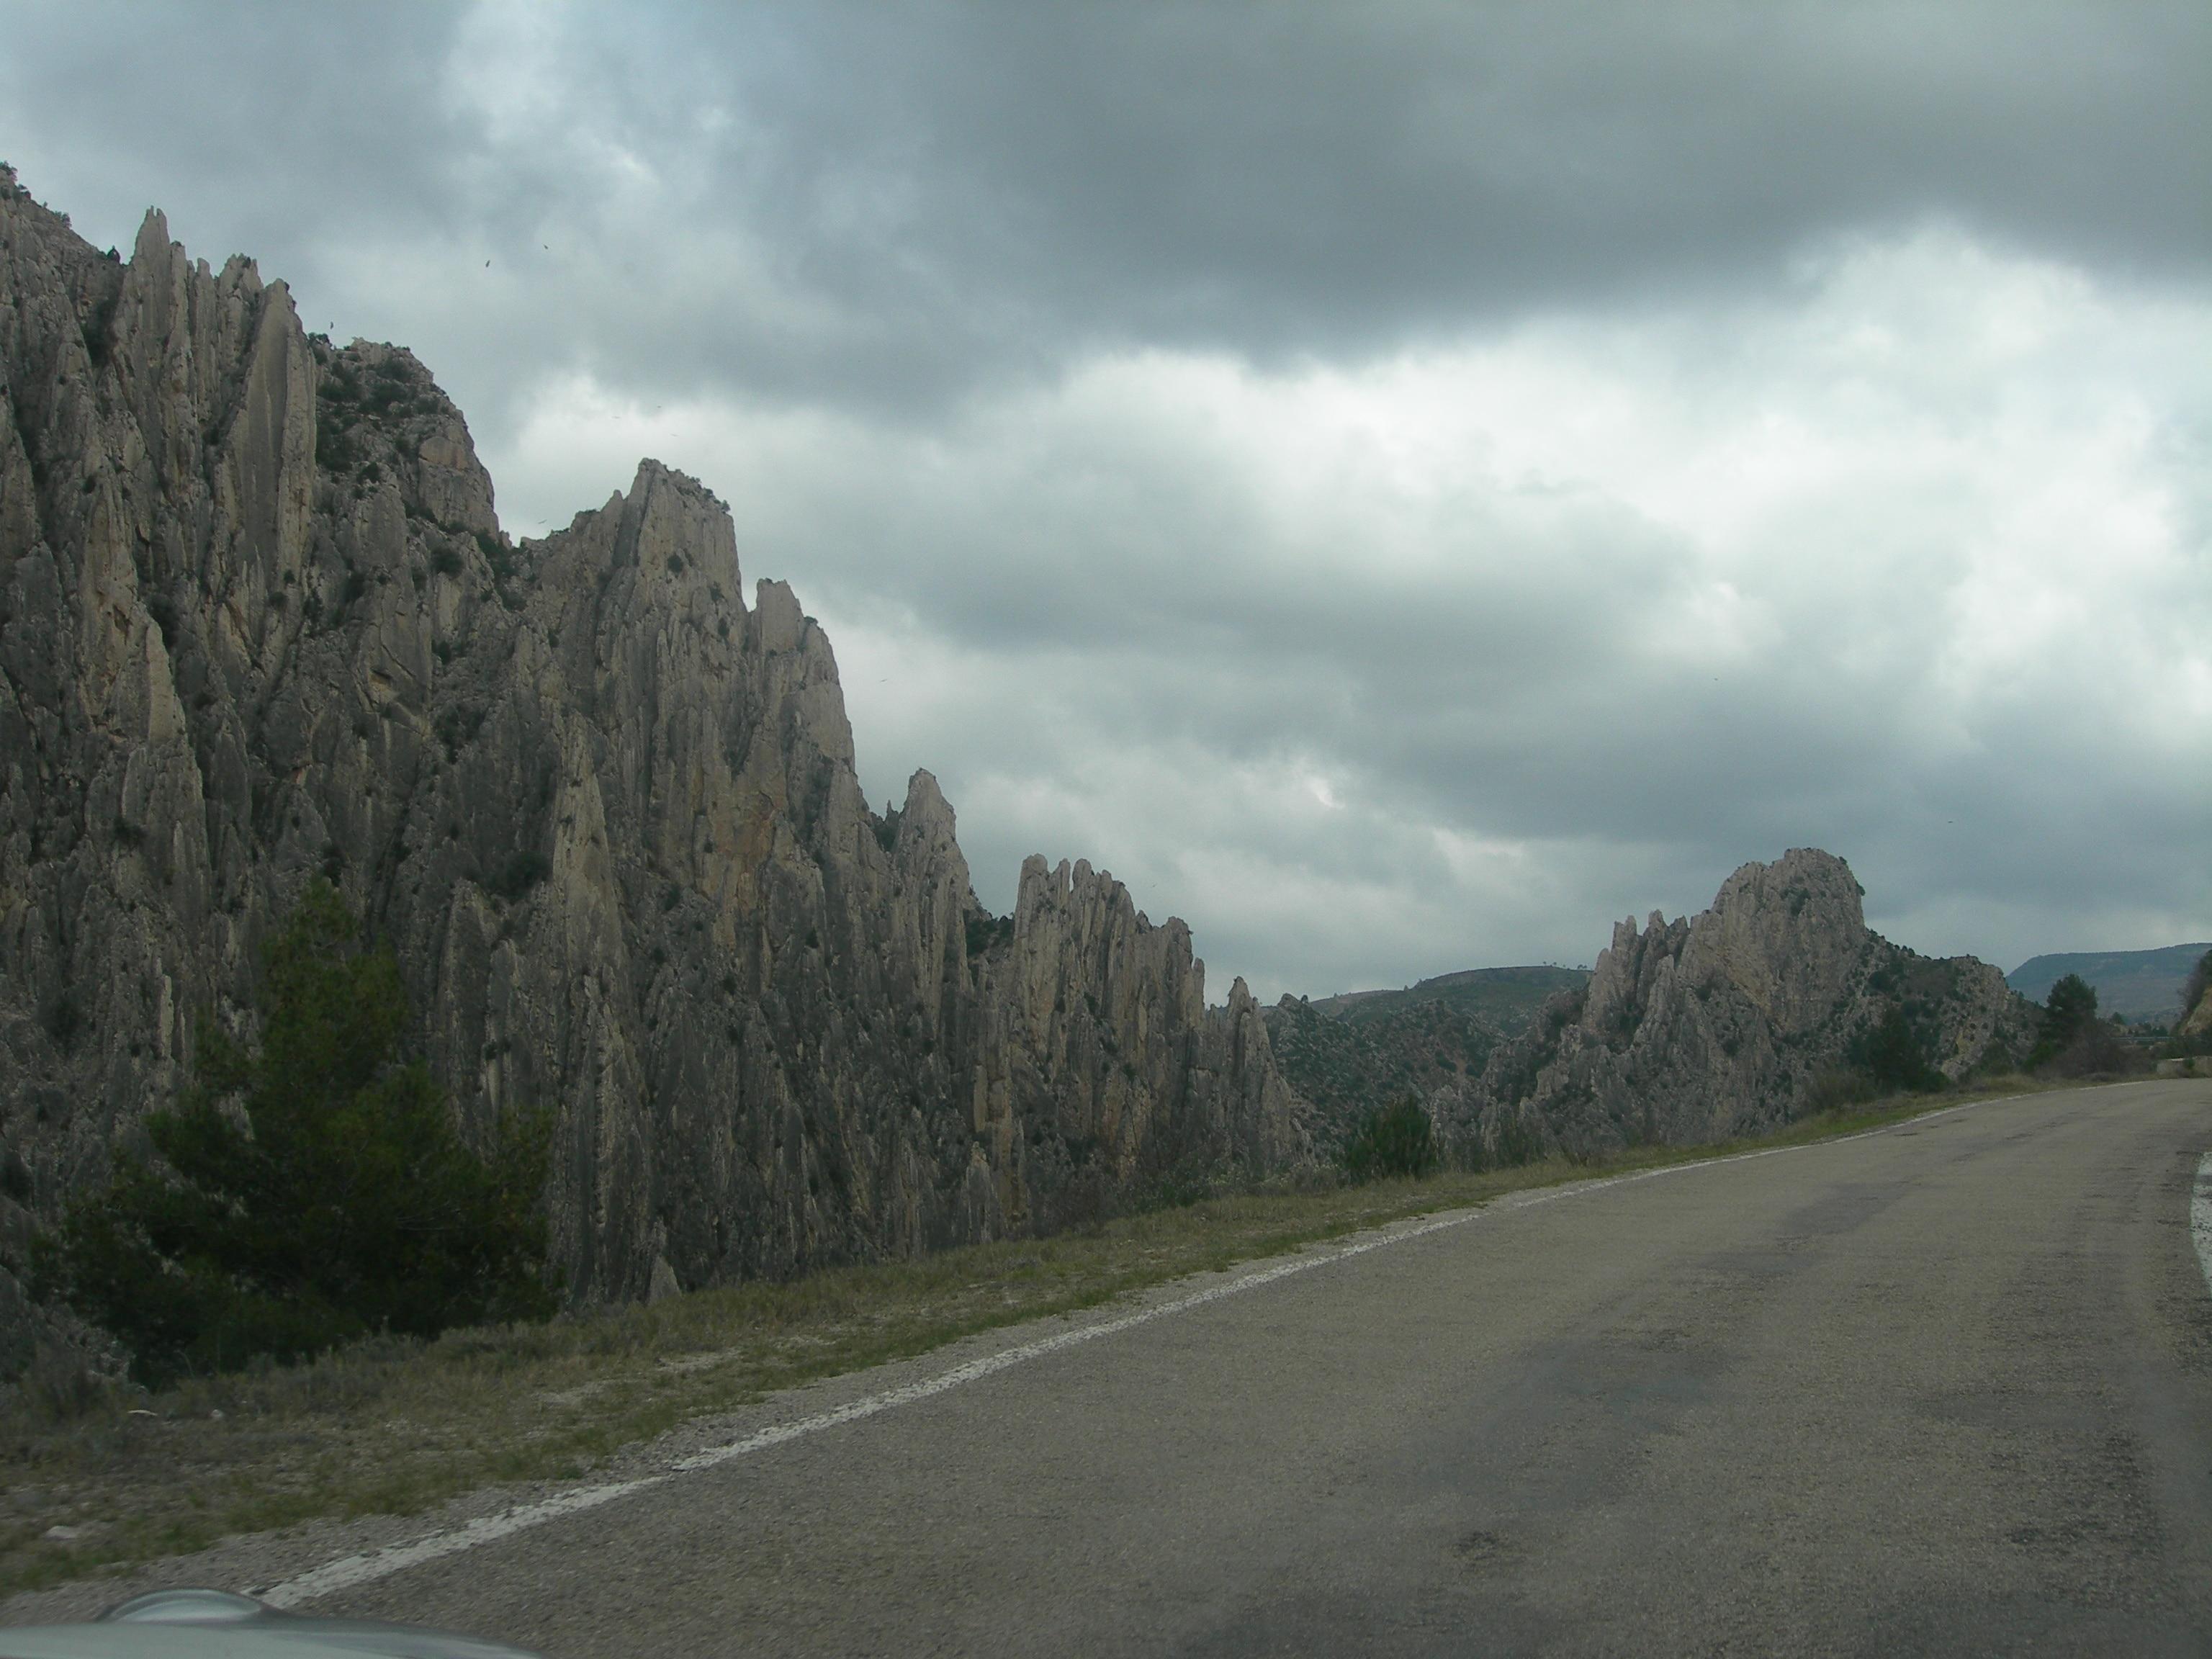 Villarluengo, Aragon, Spain